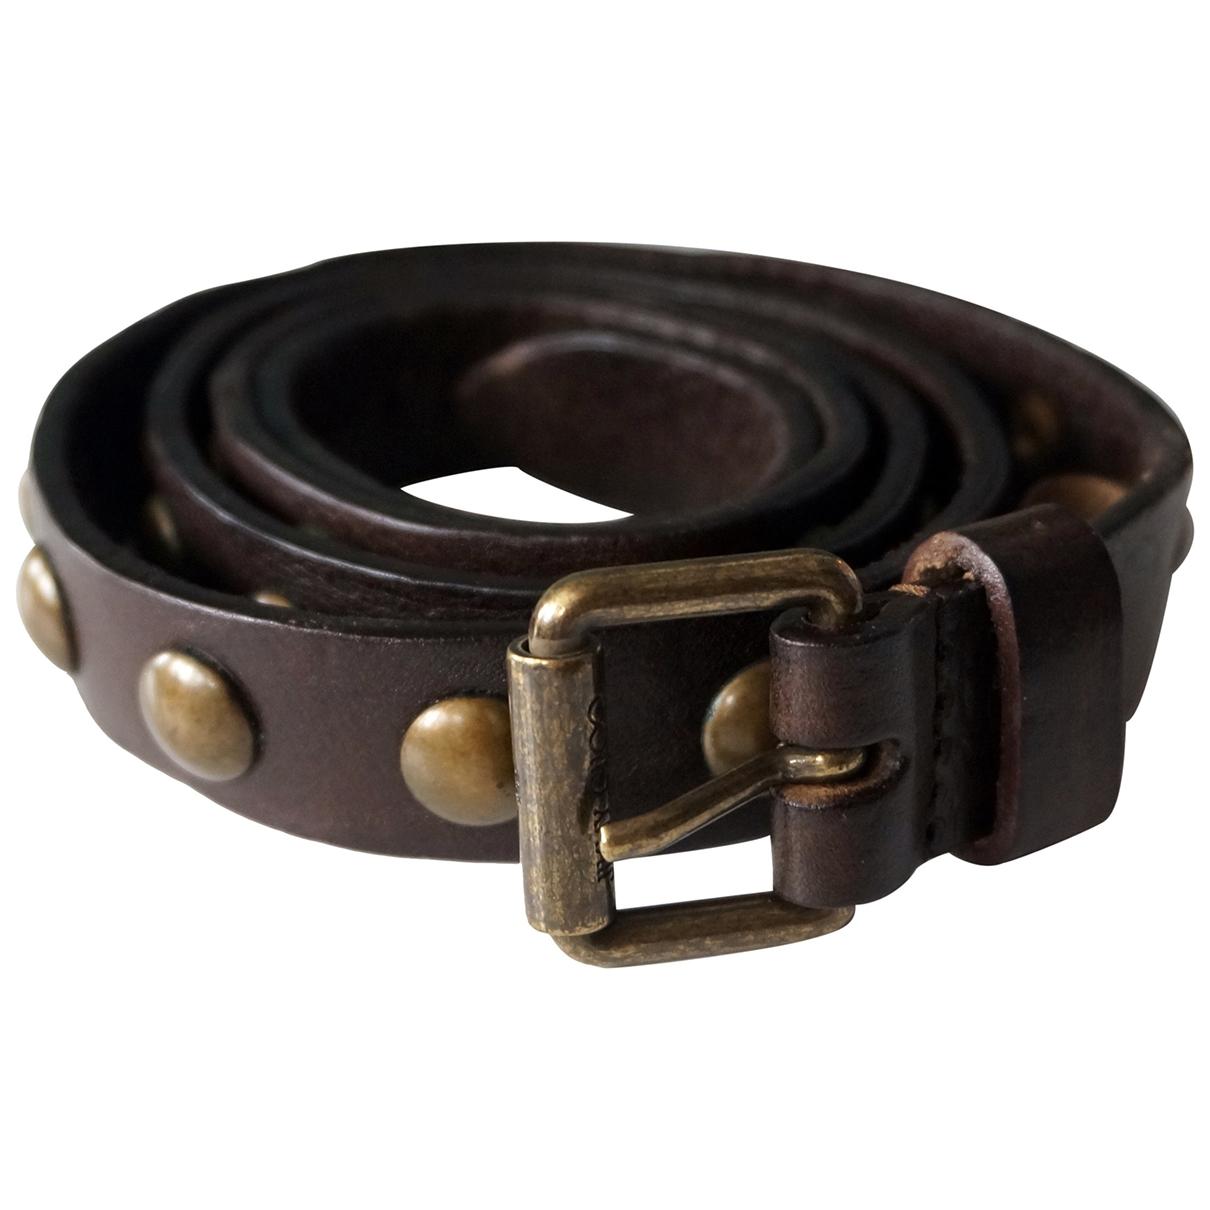 Cinturon de Cuero Jimmy Choo For H&m